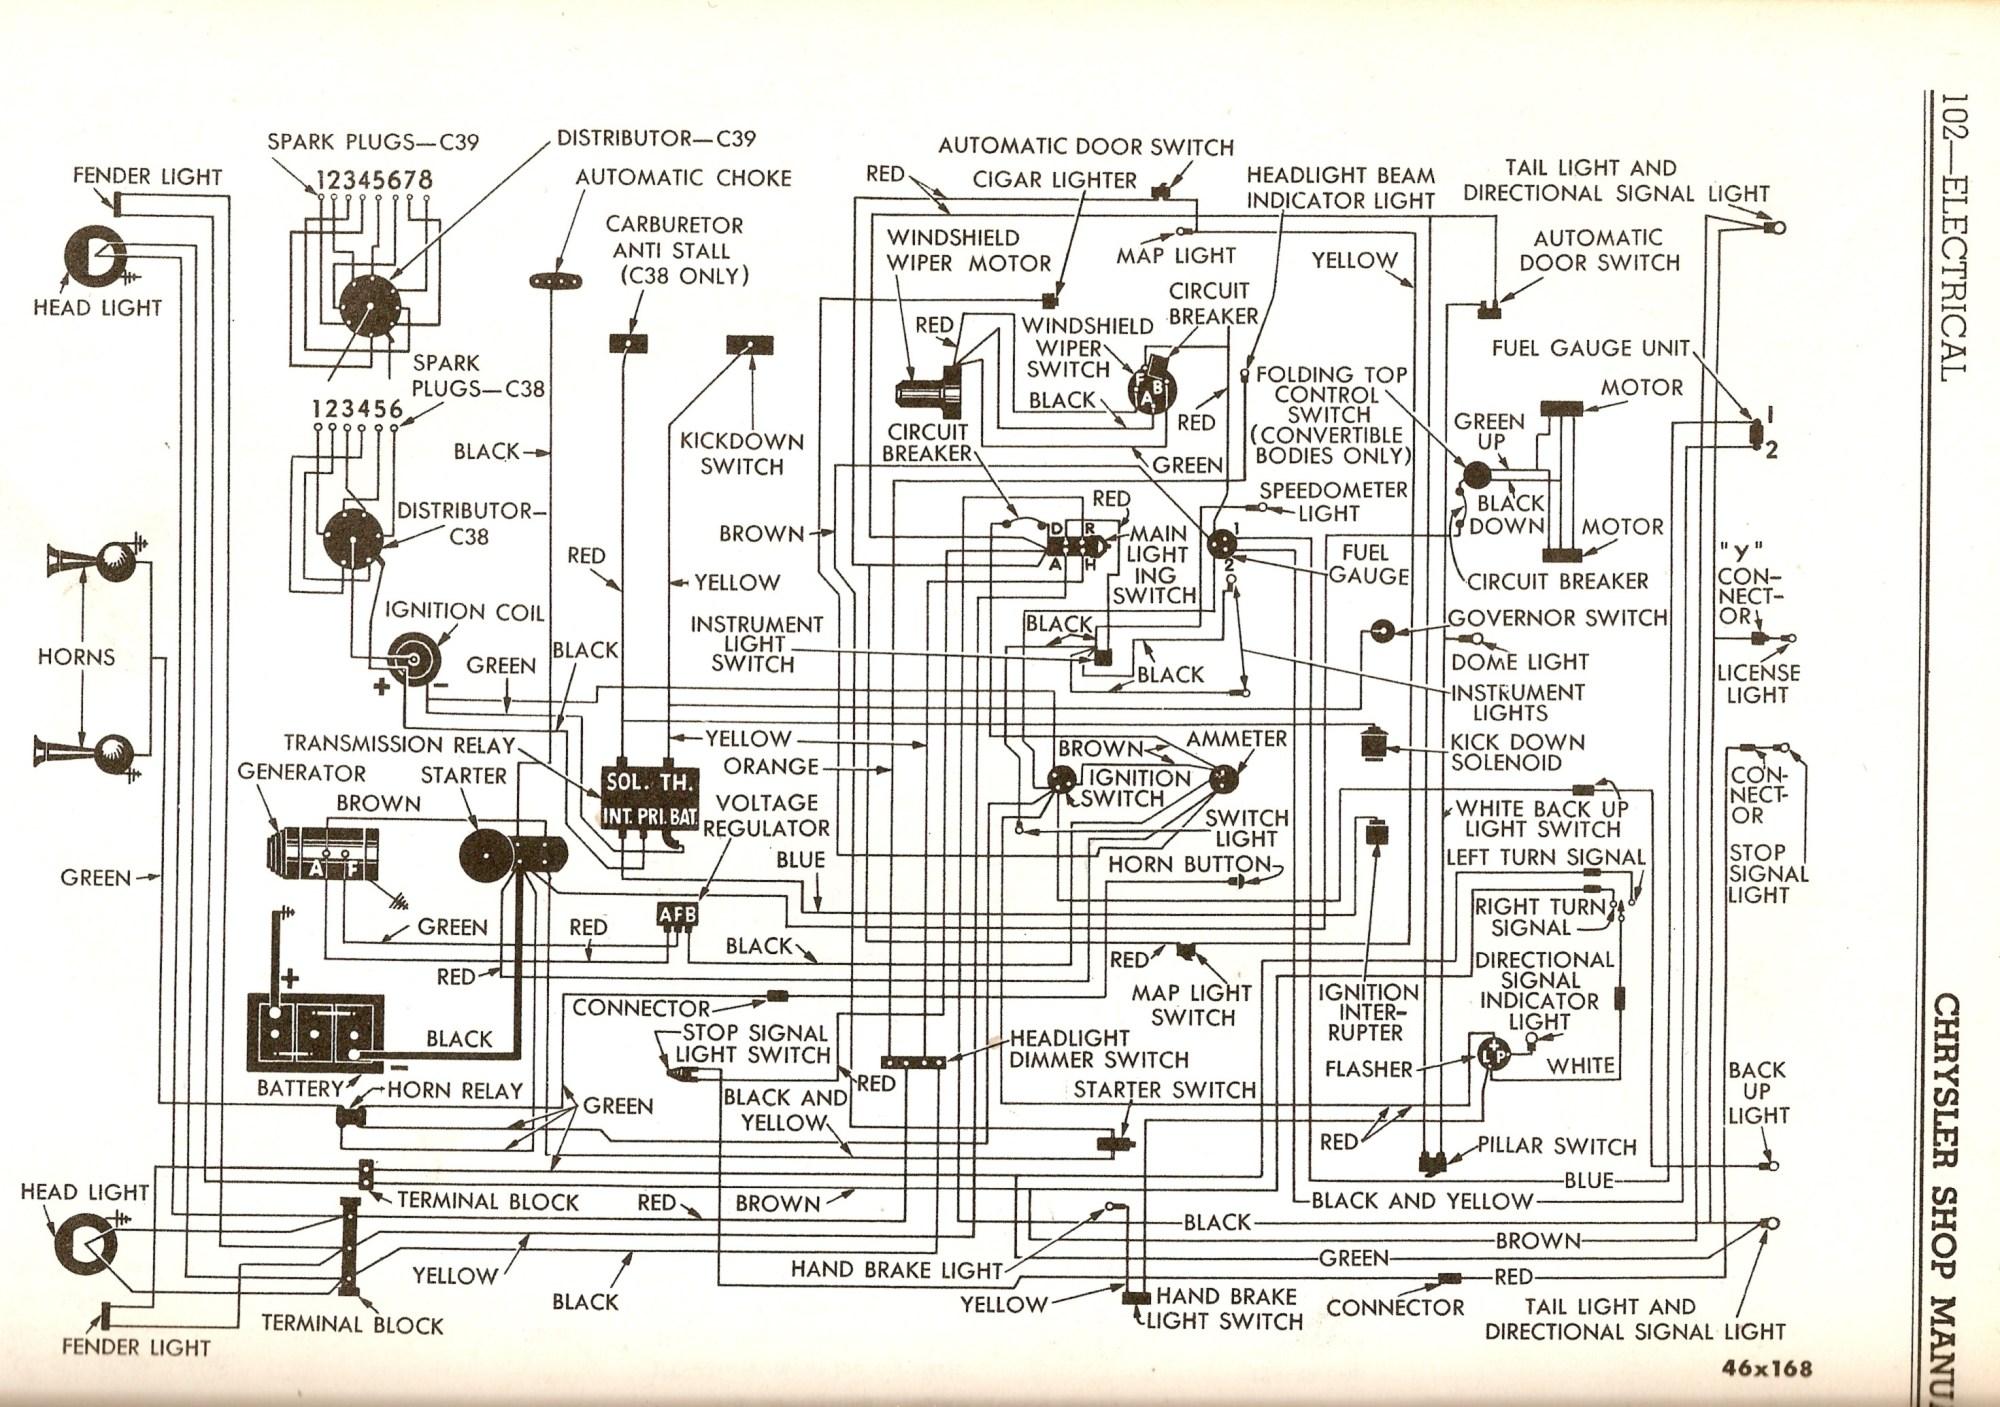 hight resolution of 54 chrysler new yorker wiring diagram simple wiring diagram schema 1967 chrysler new yorker 1985 chrysler new yorker wiring diagram